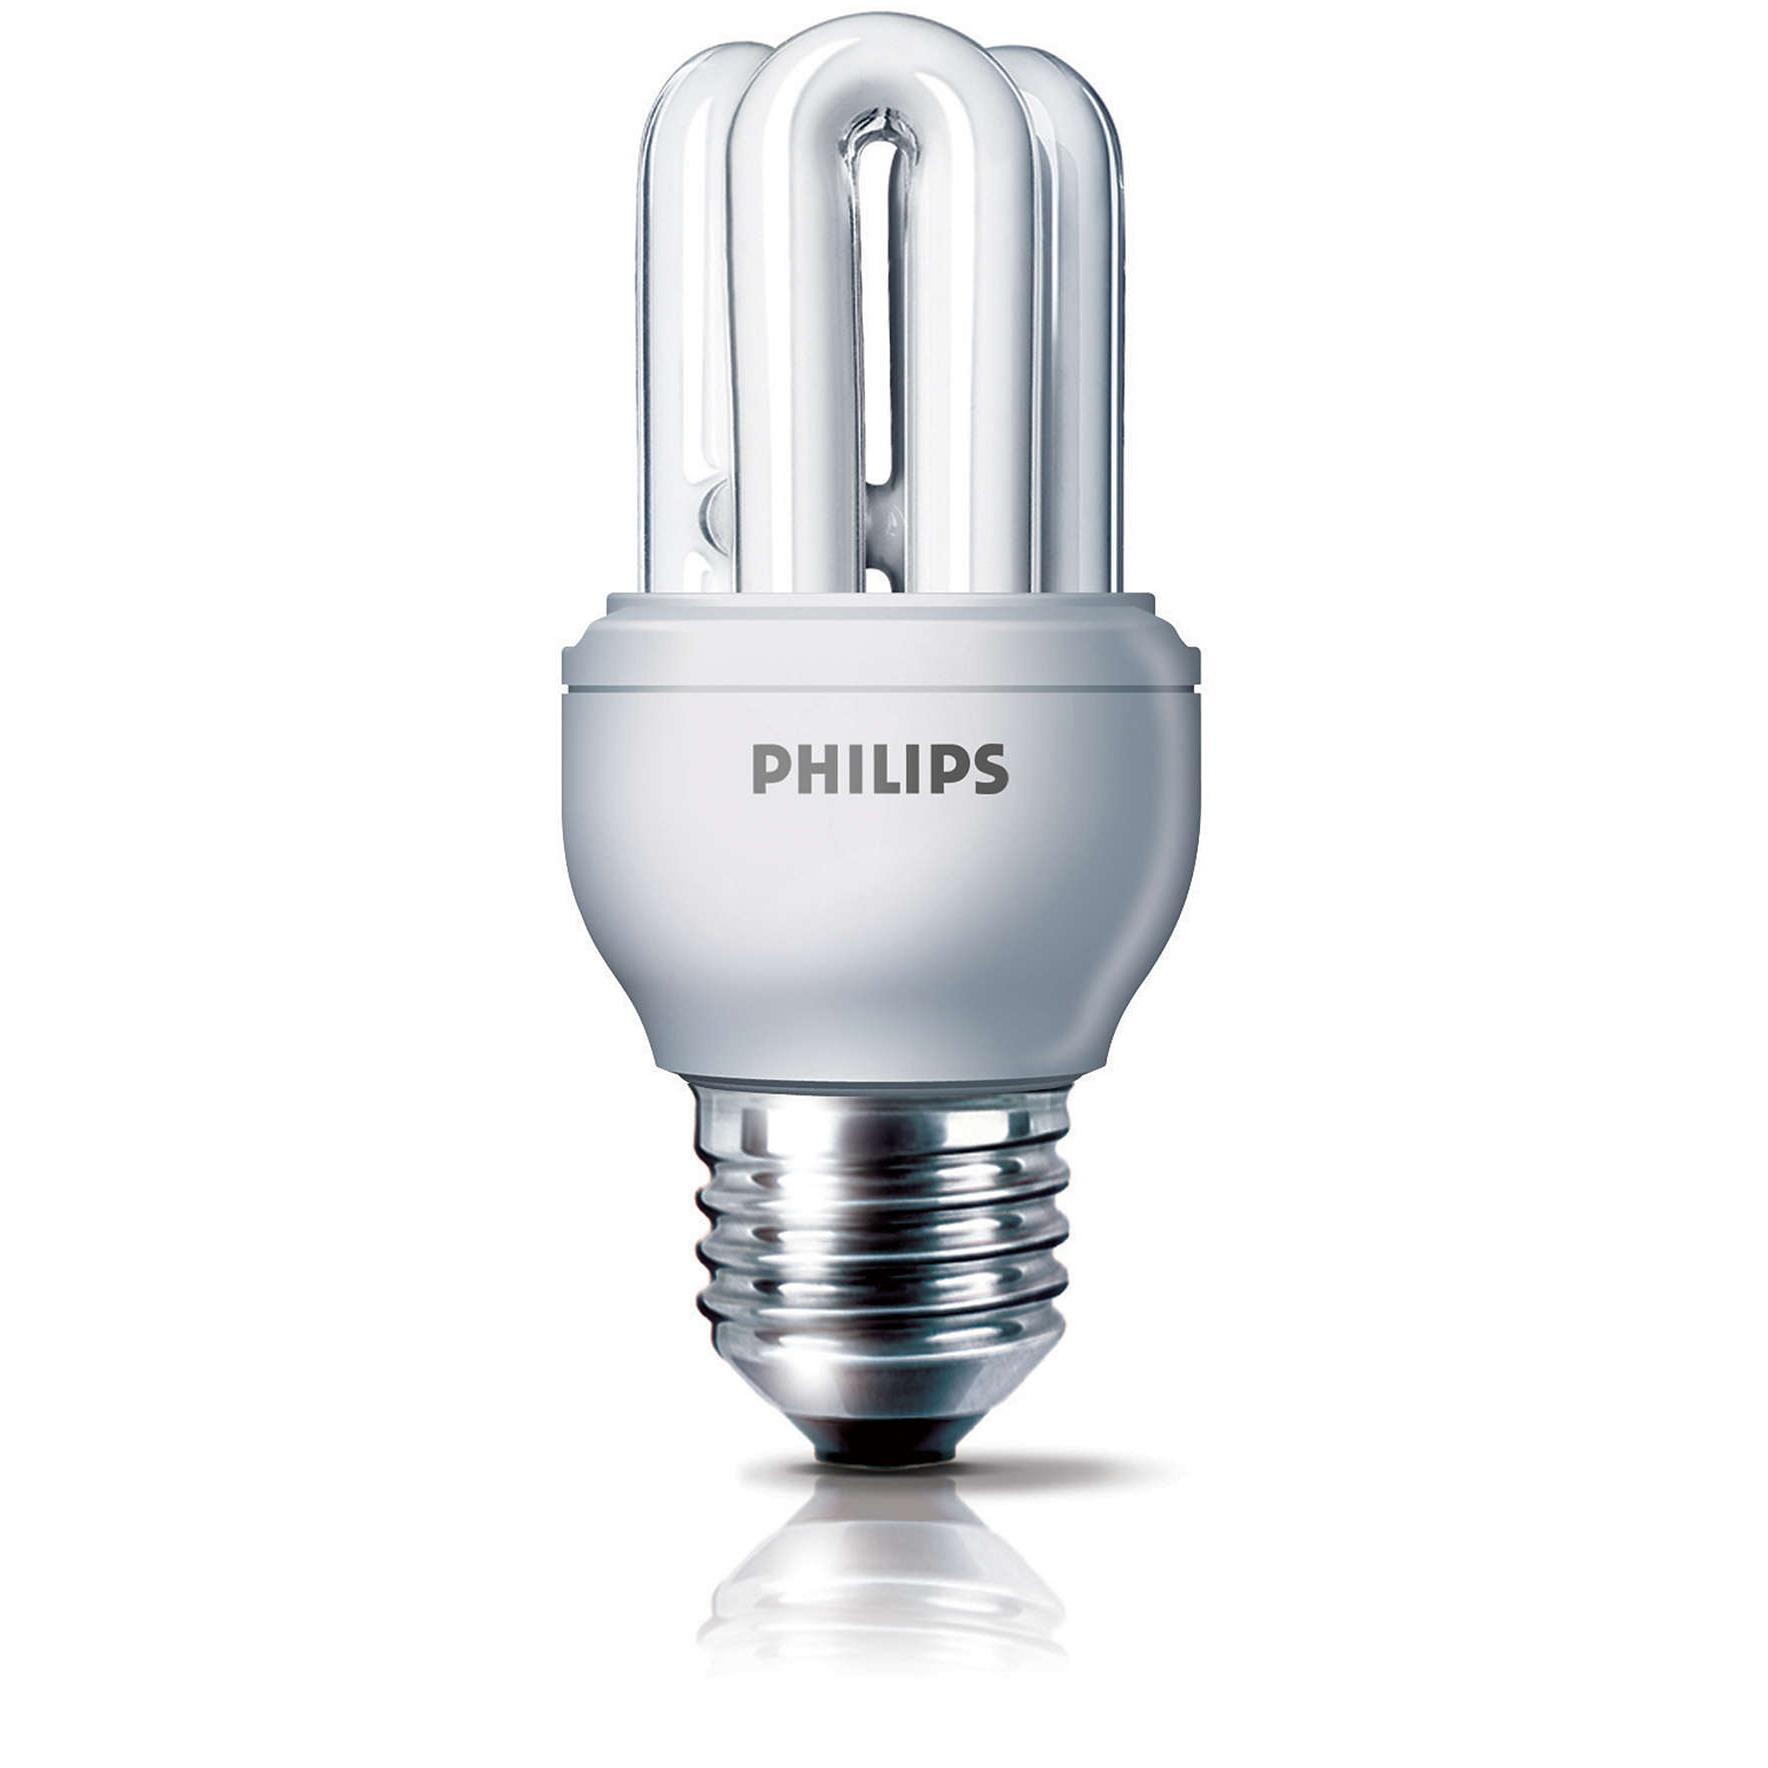 PHILIPS Genie Stick Energy Saving Bulb 8W E27 220 - 240V Cool Daylight 8710163221779 Singapore